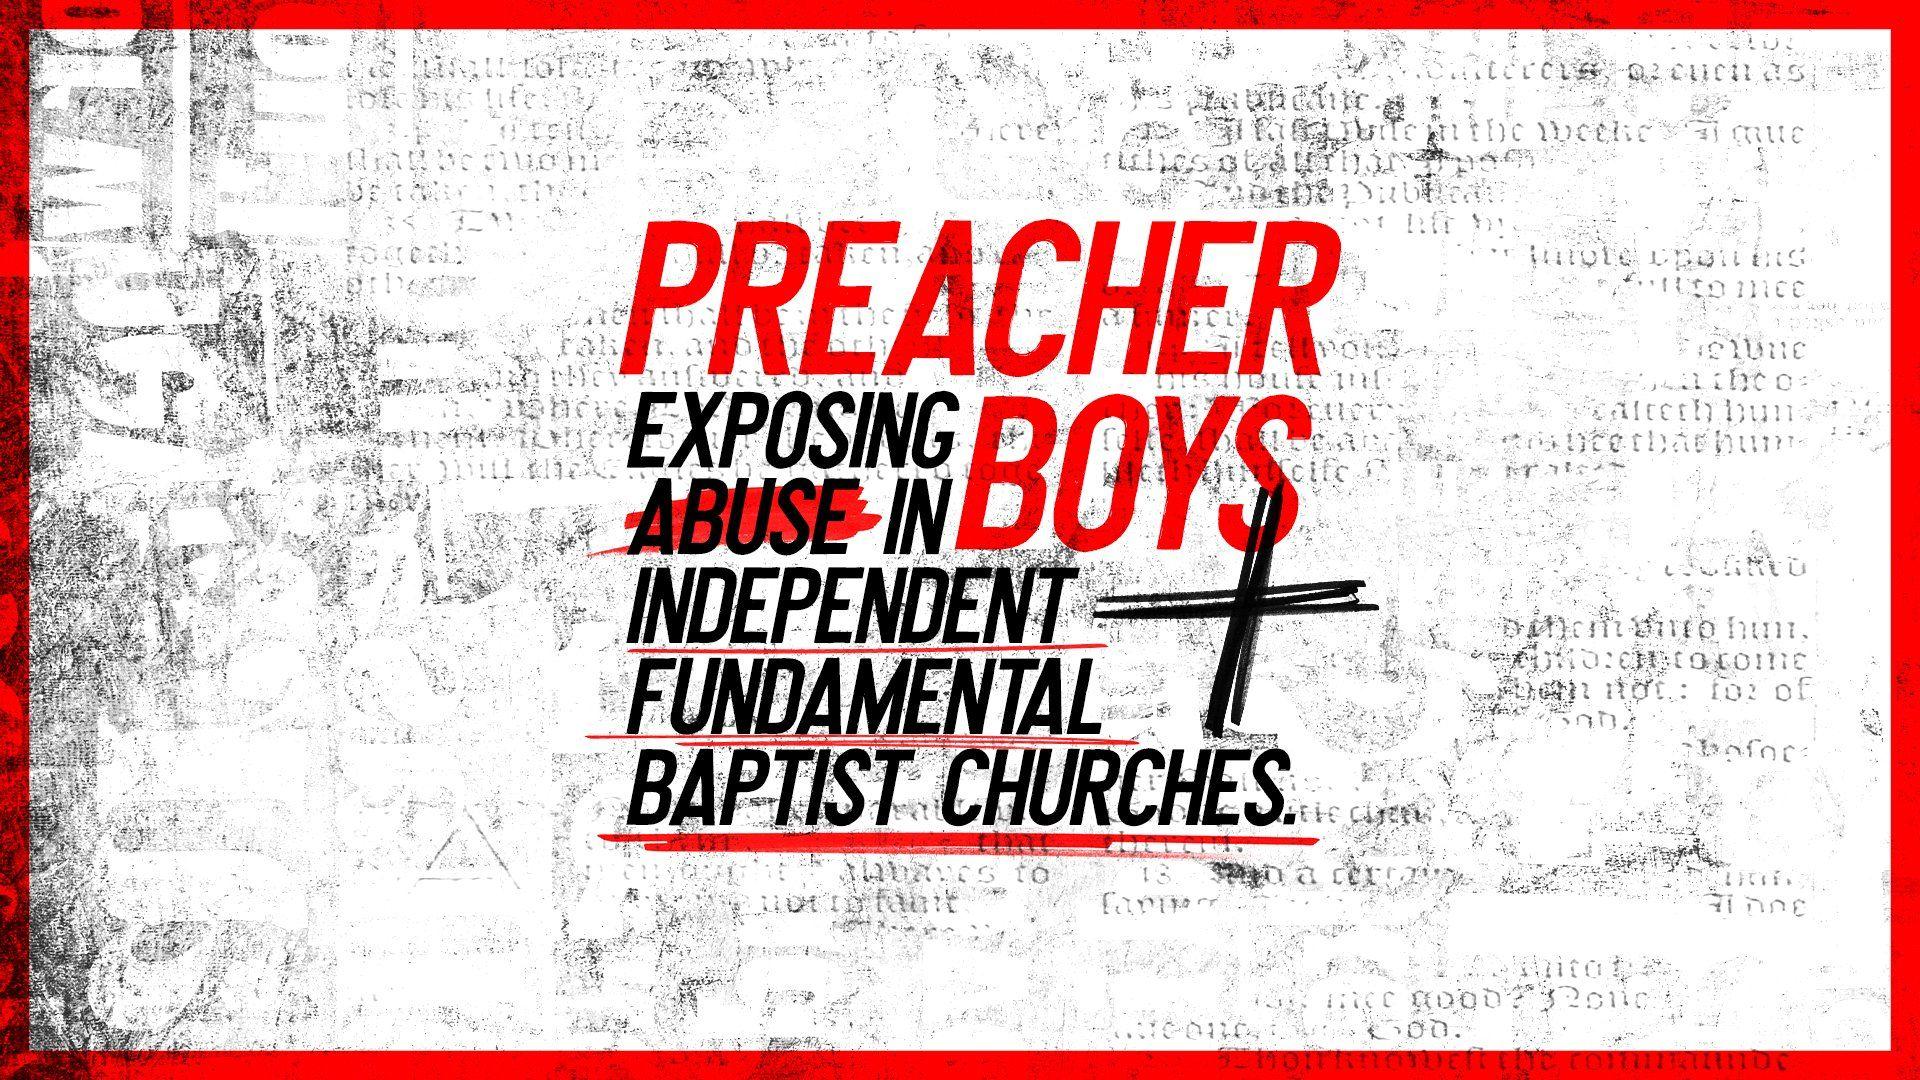 www.preacherboysdoc.com